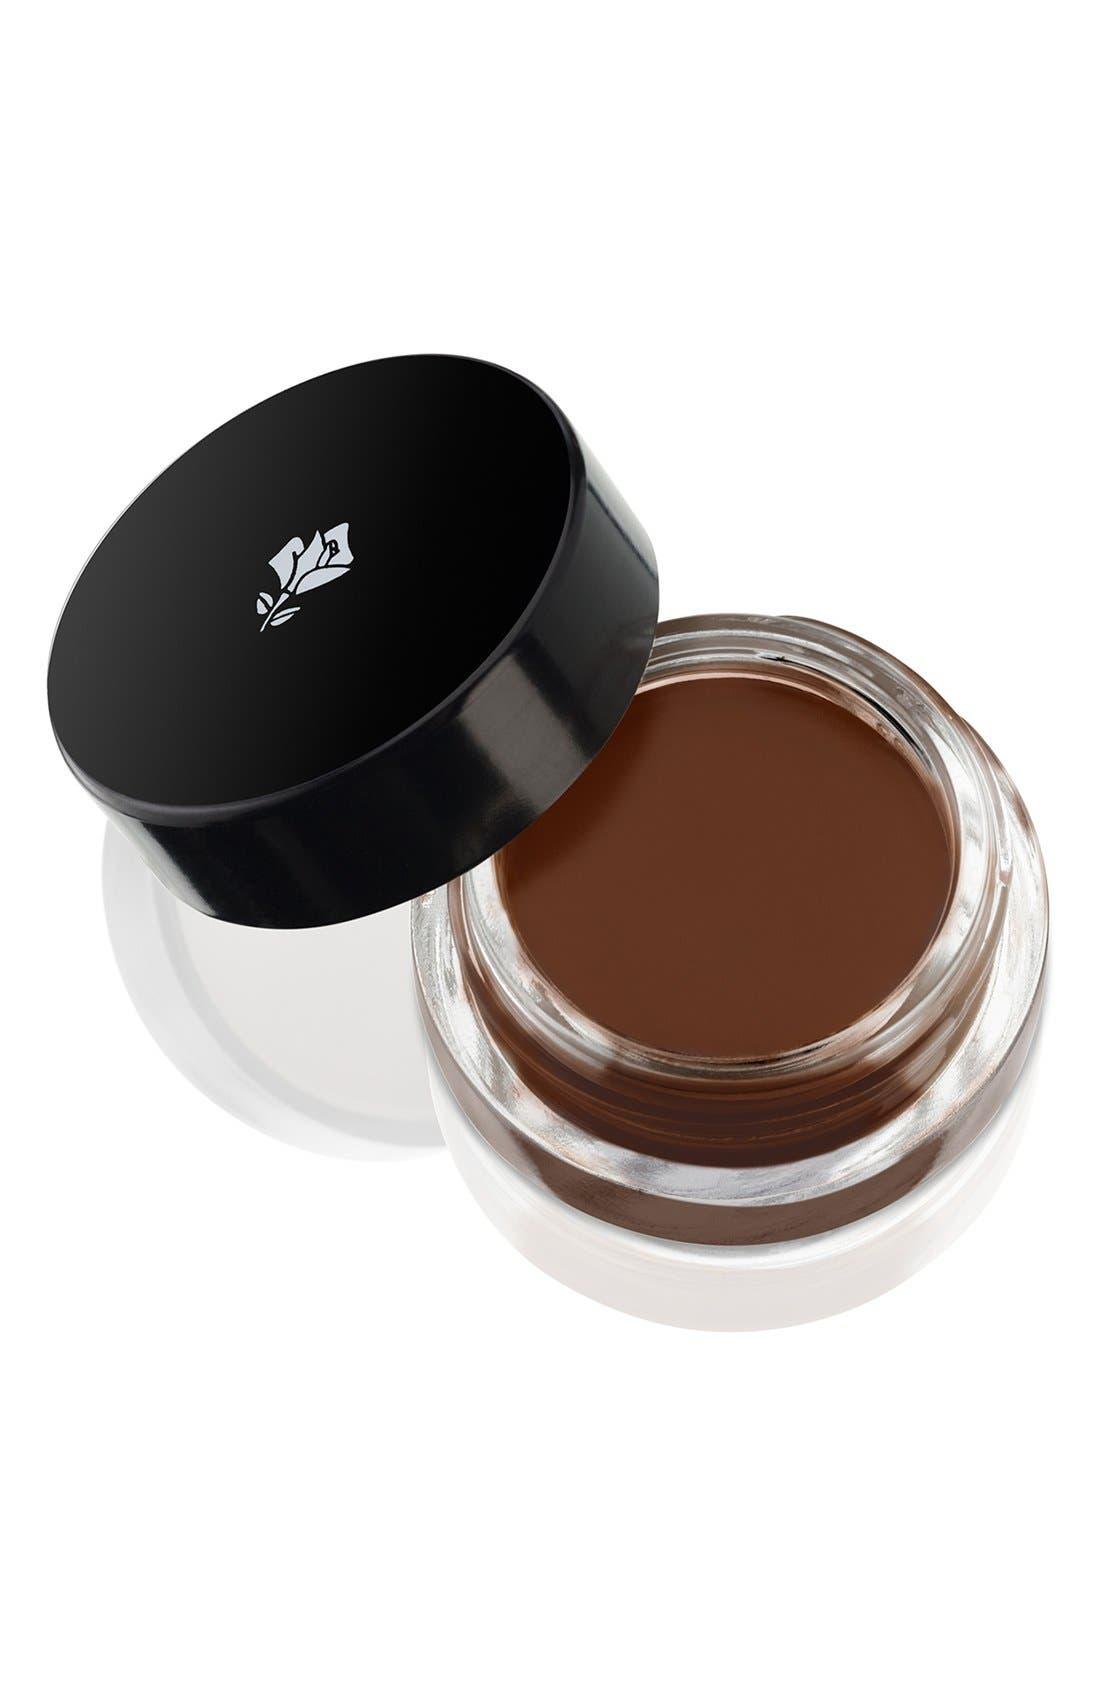 LANCÔME, Sourcils Waterproof Eyebrow Gel-Cream, Main thumbnail 1, color, 02 AUBURN